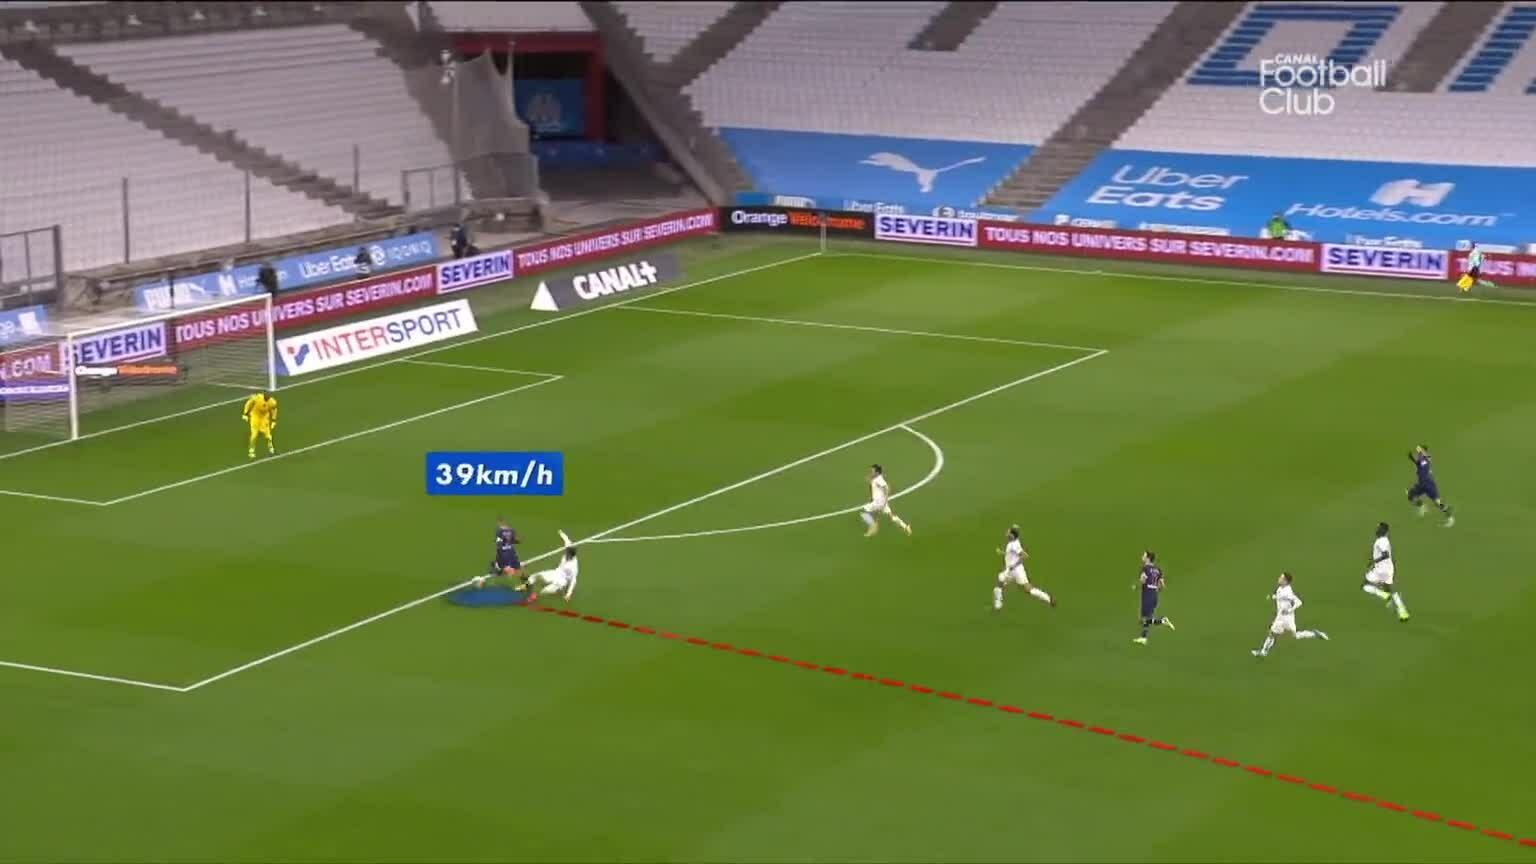 Mbappe mempercepat 99m untuk mencetak gol